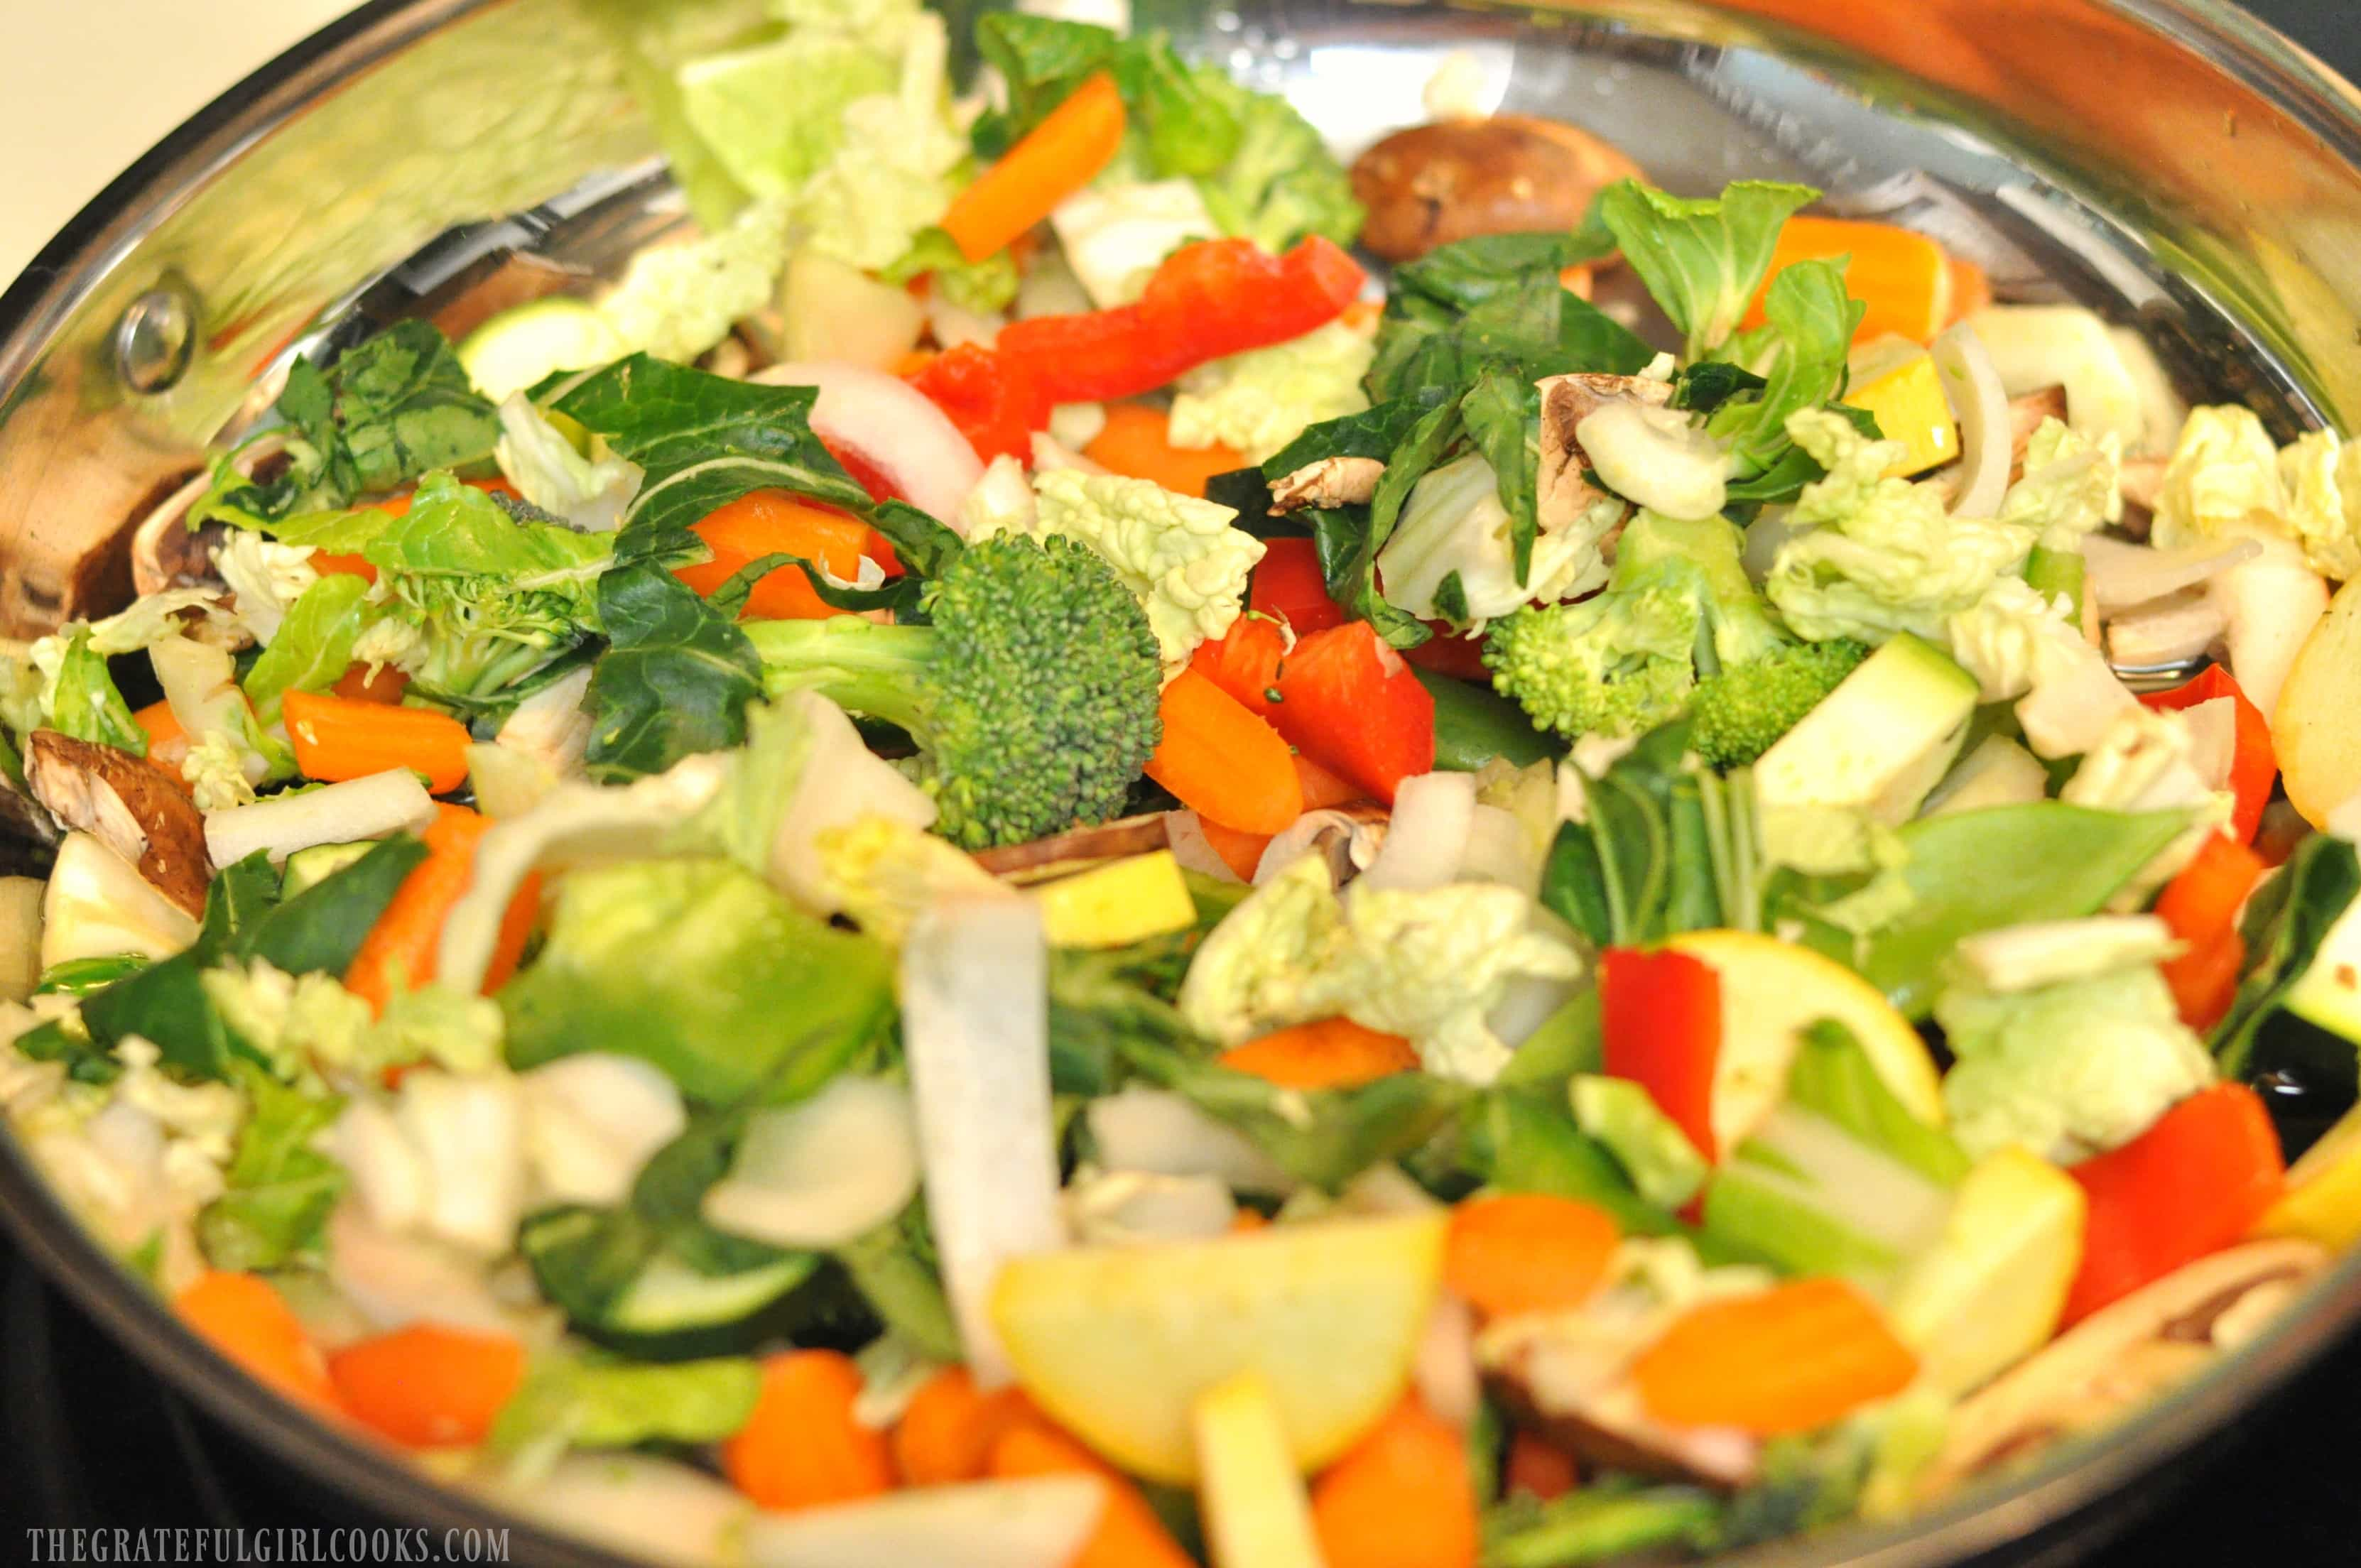 Chicken And Veggie Stir-Fry / The Grateful Girl Cooks!